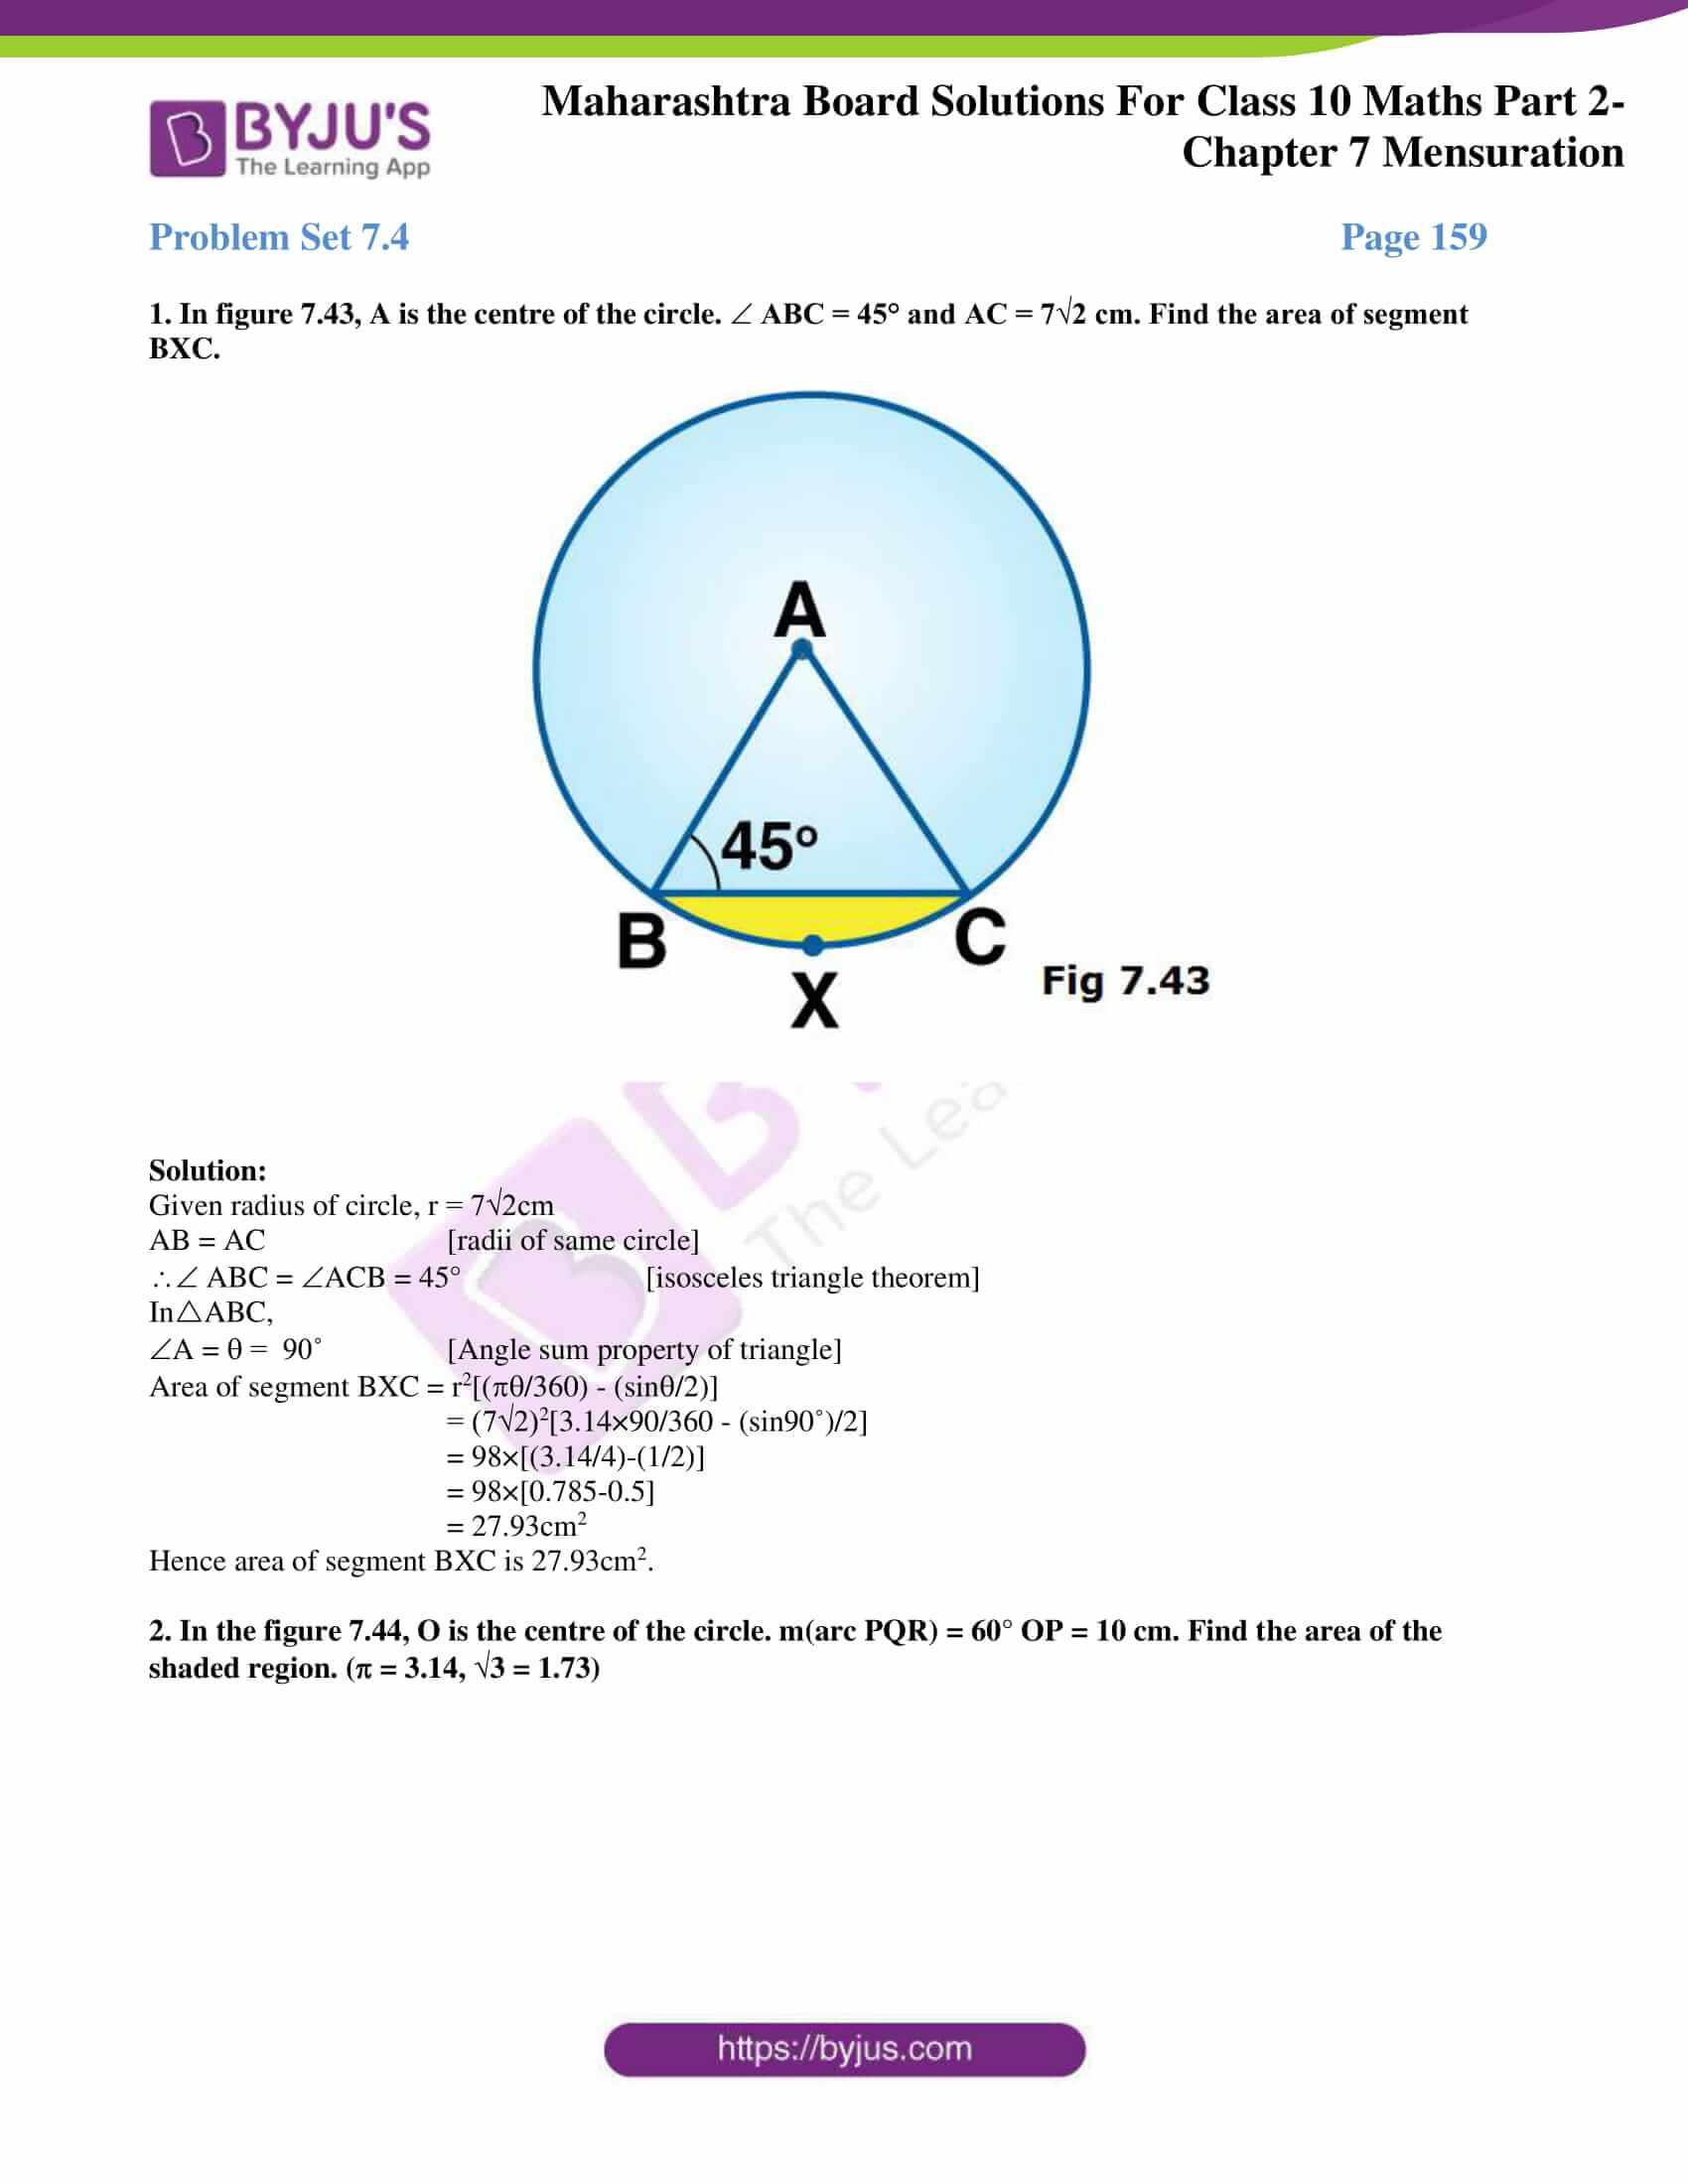 msbshse sol class 10 maths part 2 chapter 7 18